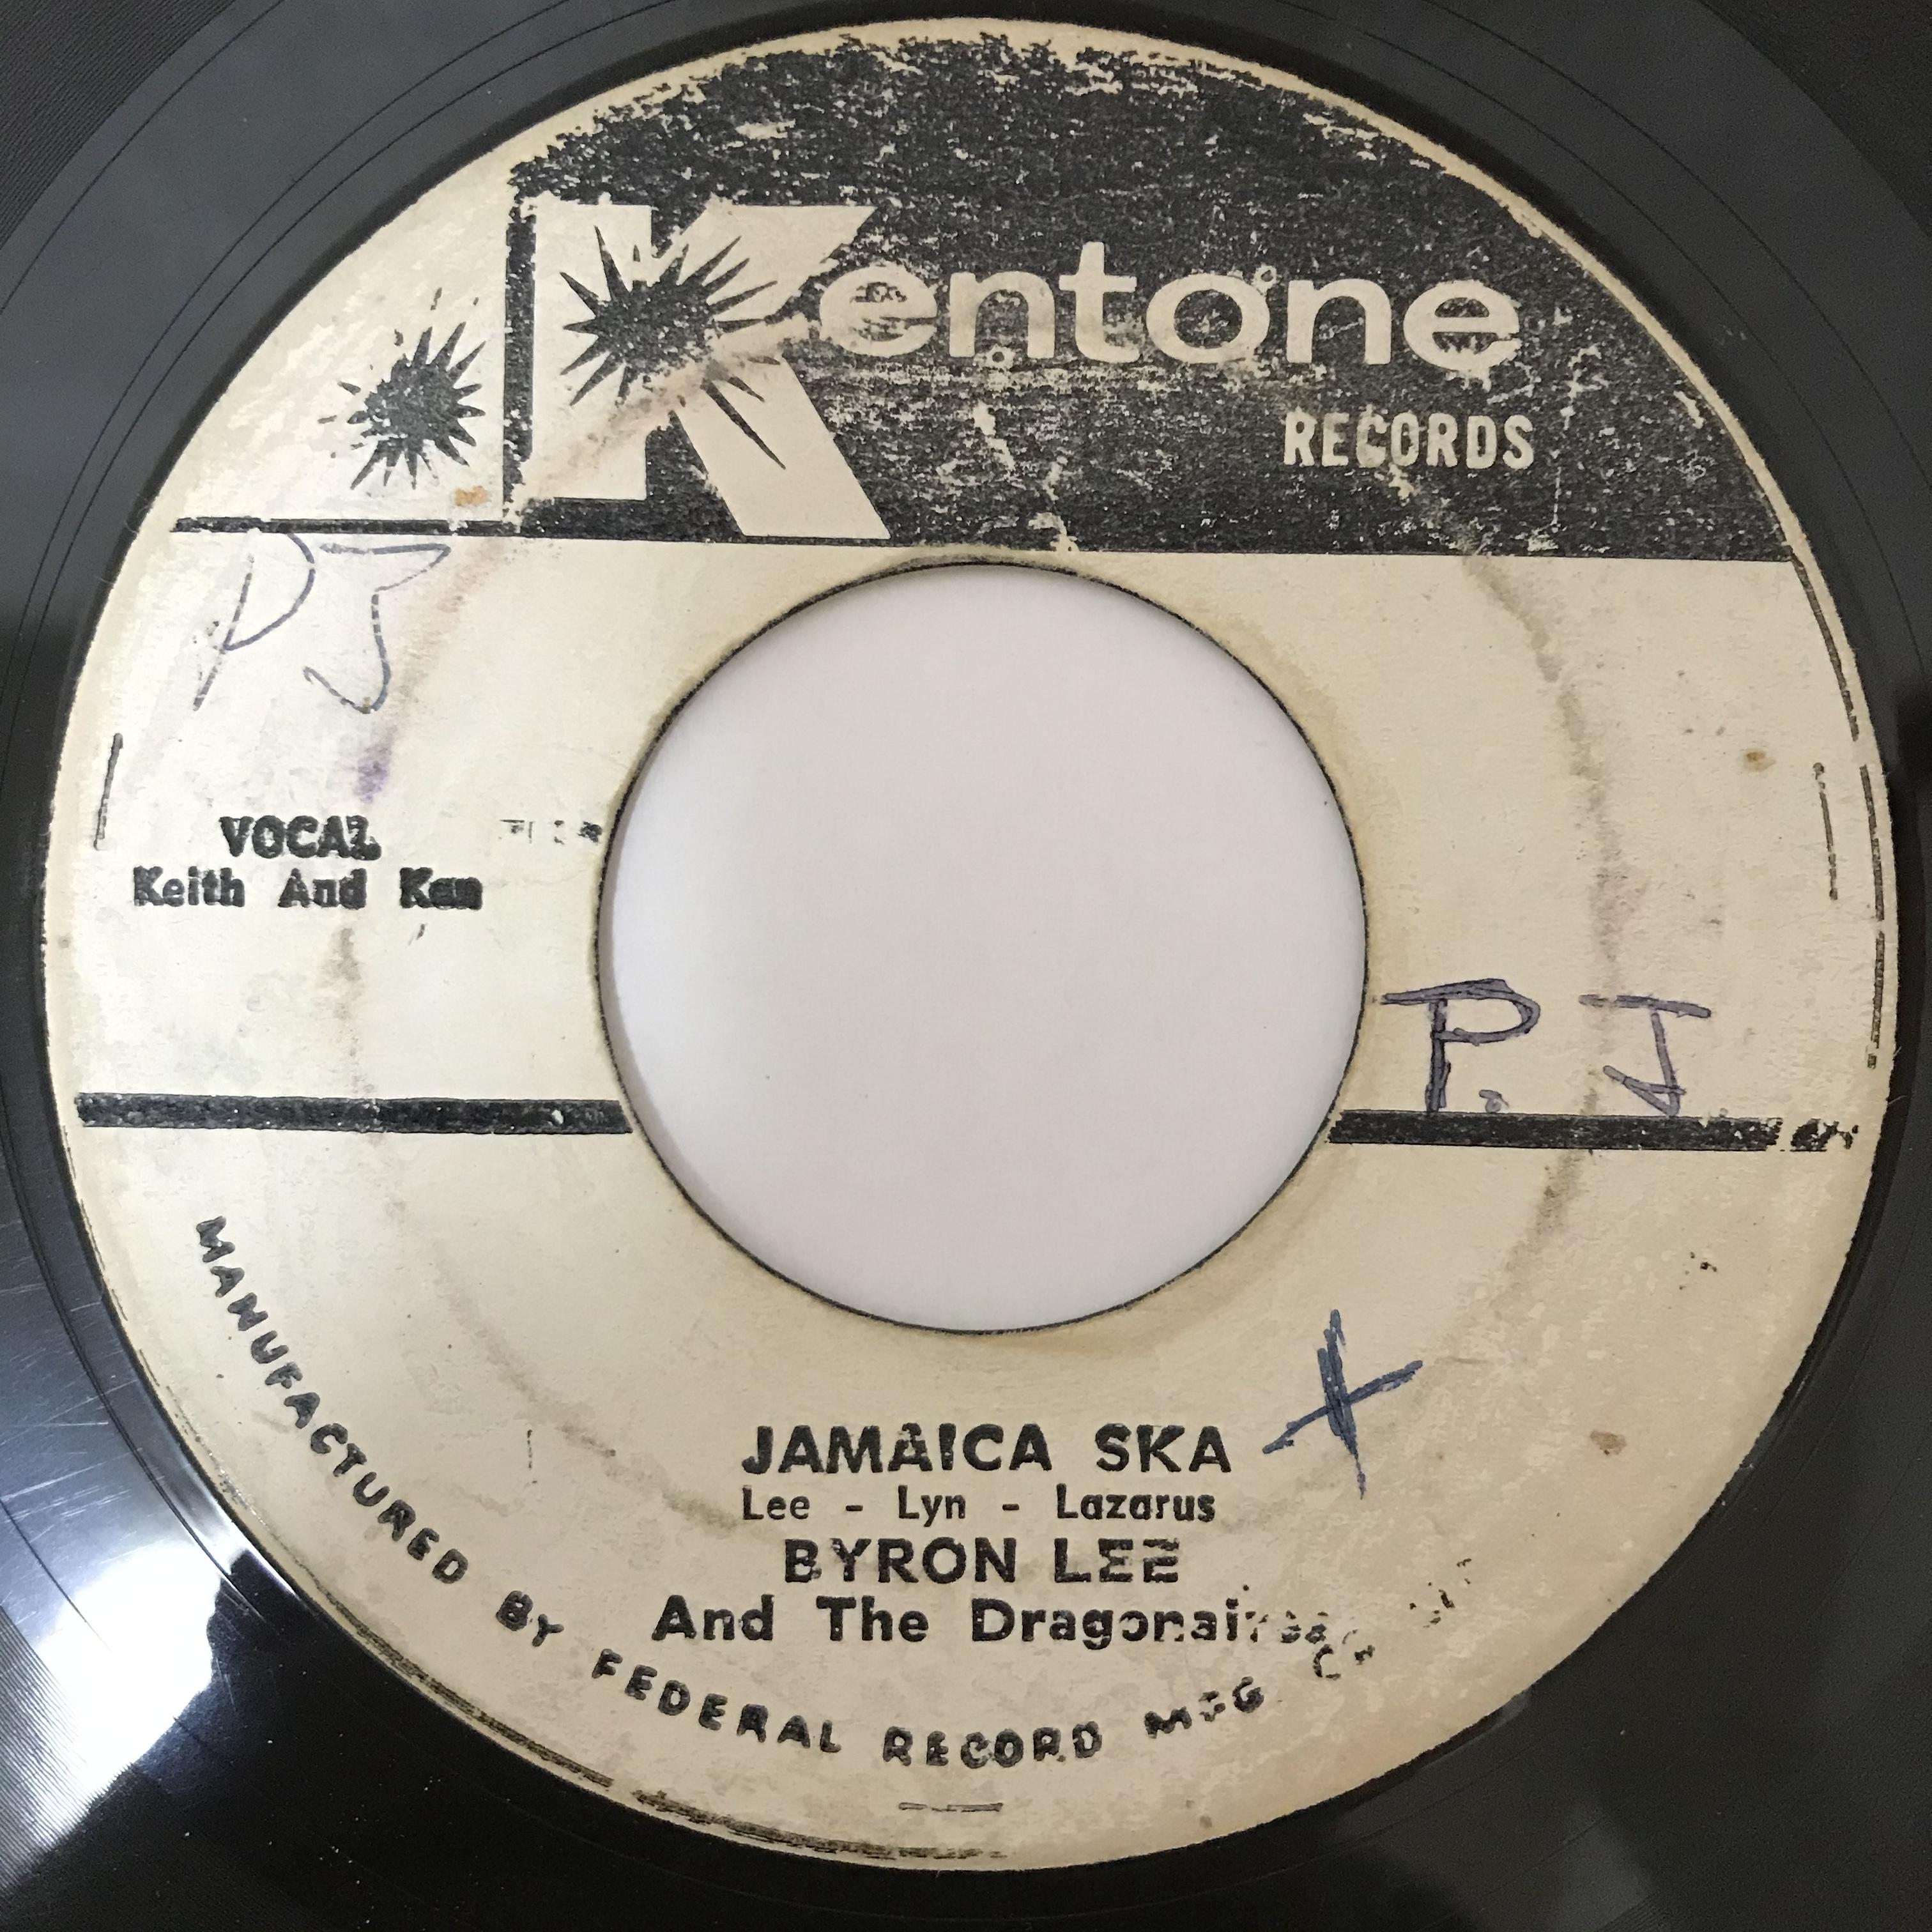 Byron Lee(バイロンリー), Dragonaires(ドラゴネアーズ) - Jamaica Ska【7-10909】